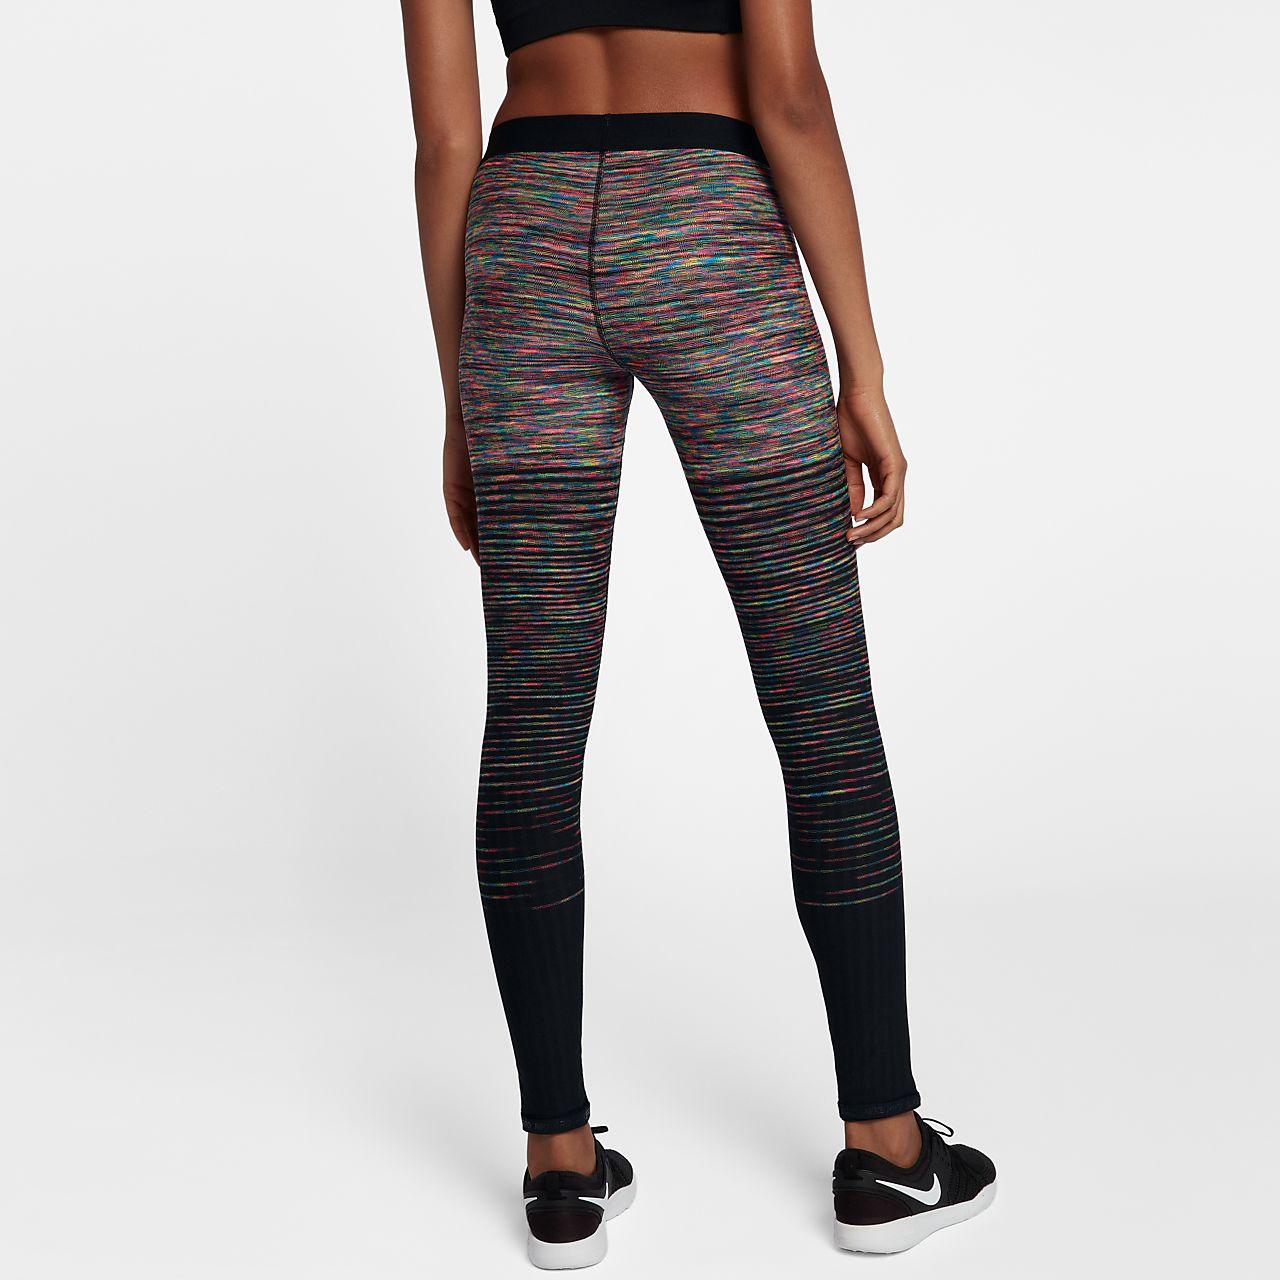 Nike Pro HyperWarm. Women's Training TightsSAR 299